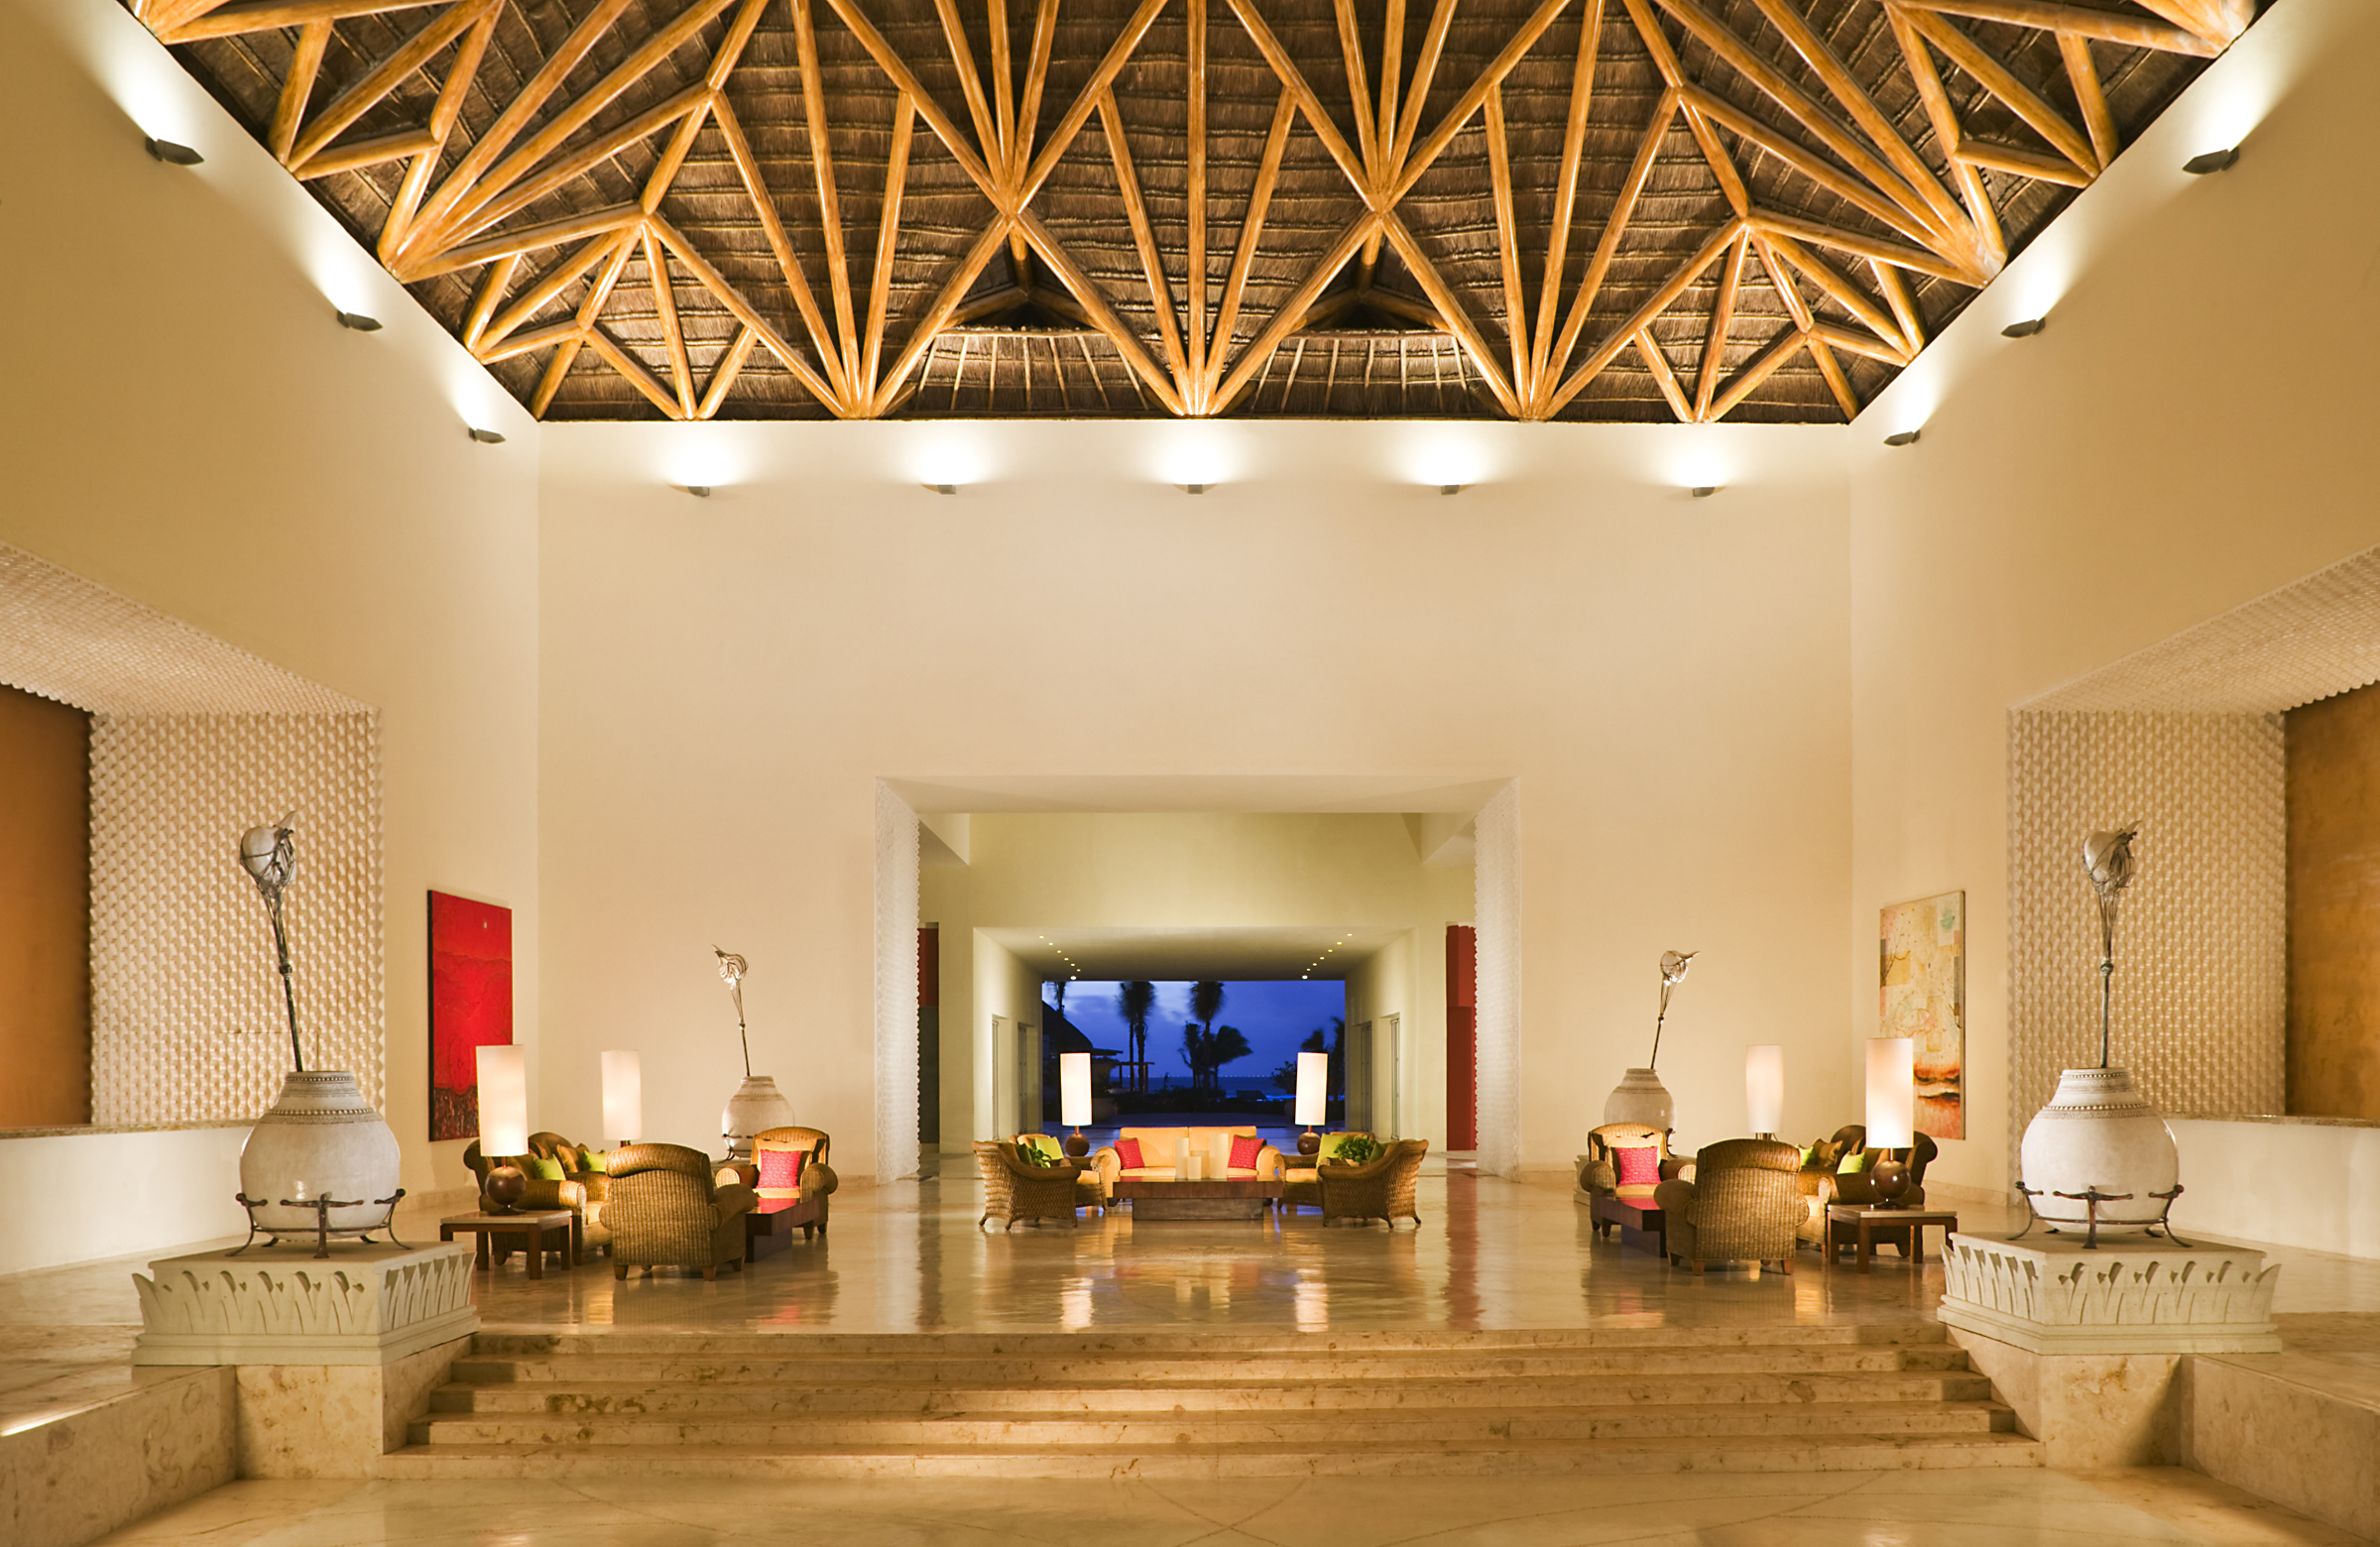 Velas Resorts Interior Designer Meln Castro Ardavn Receives 2014 Merit Award From The Association Of Furniture Manufacturers Jalisco